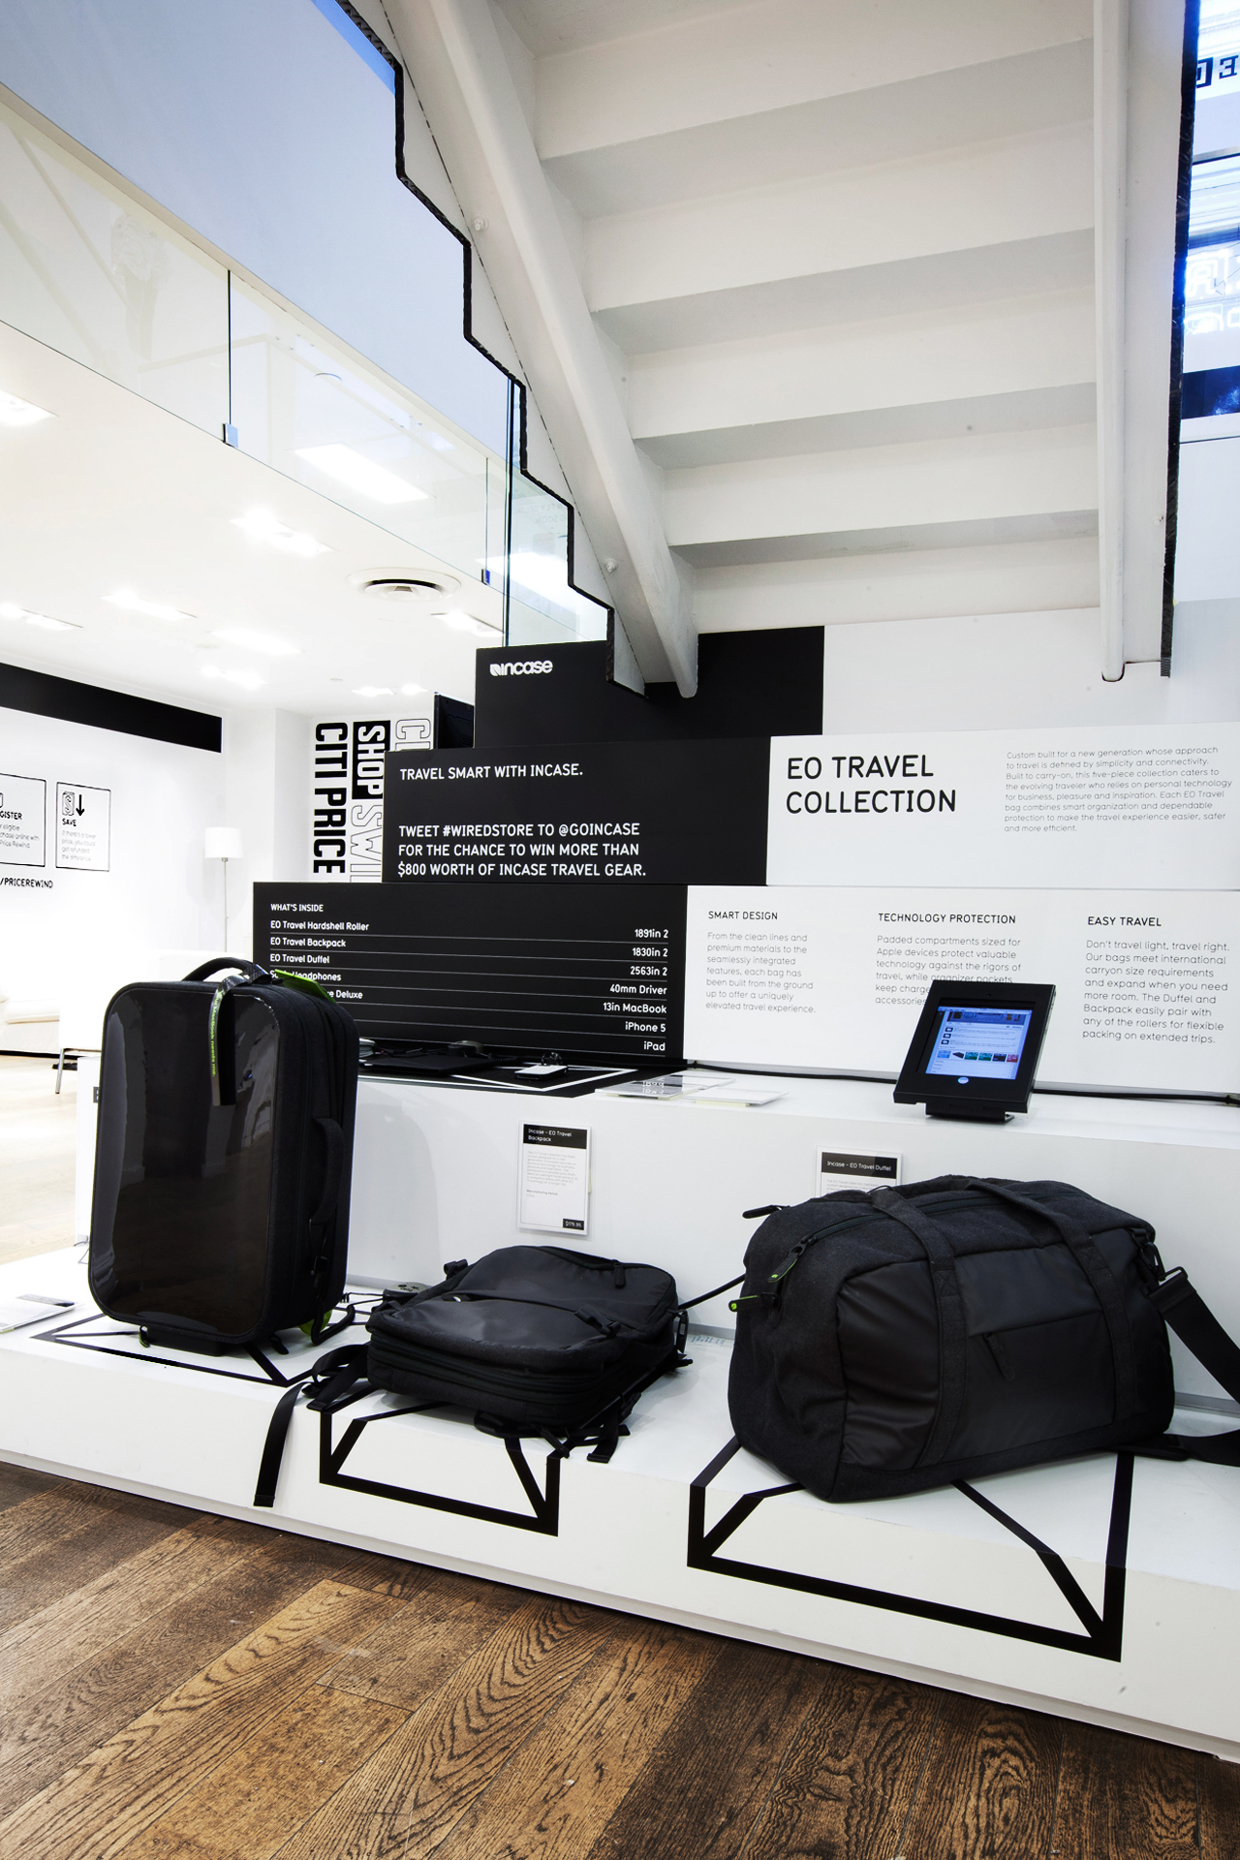 Wired Store hisheji (8)